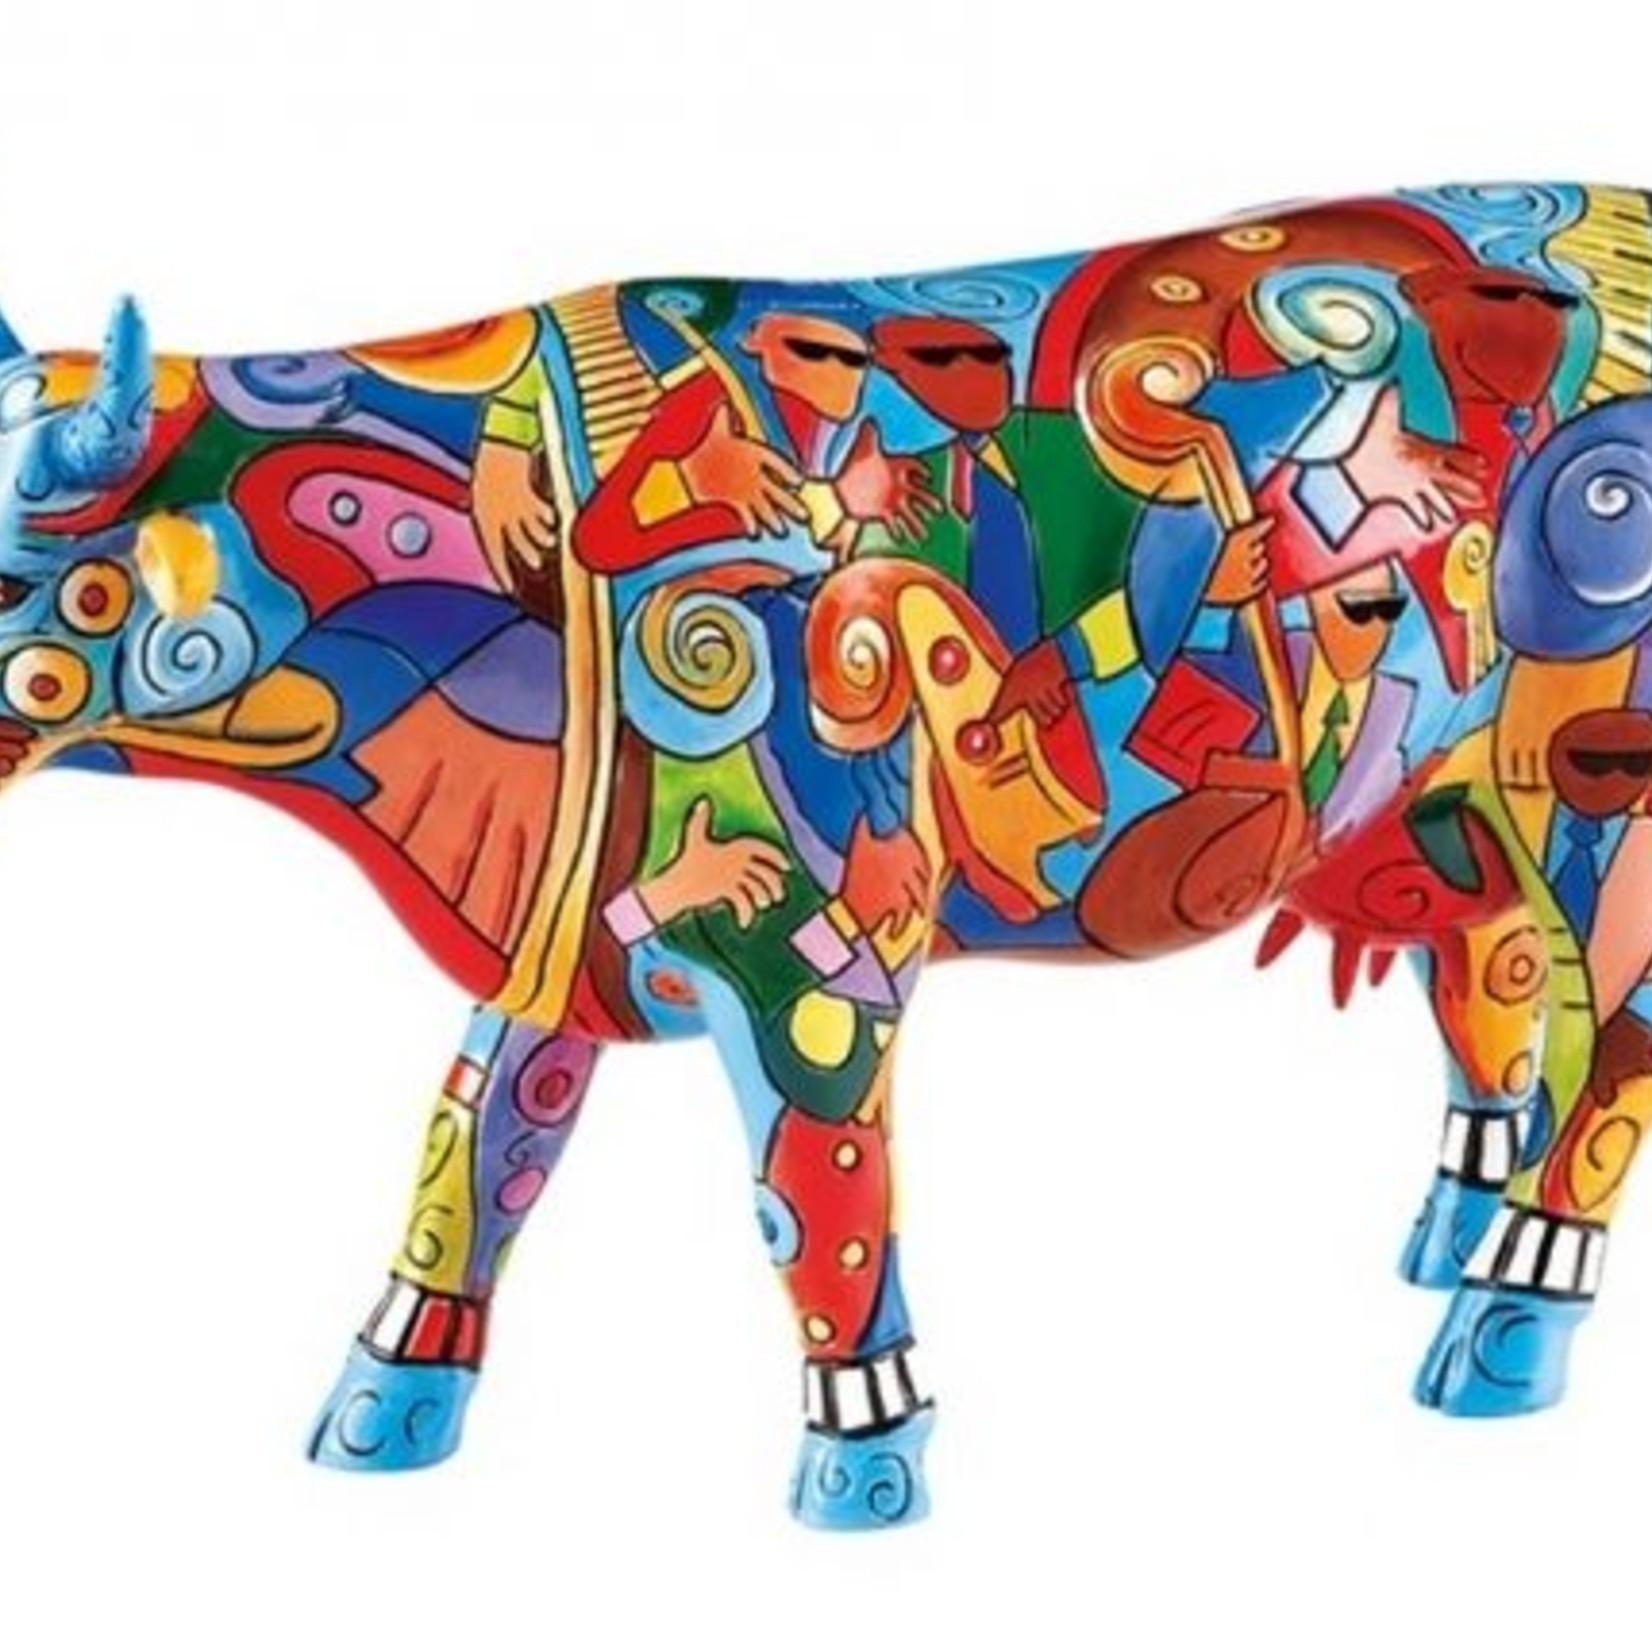 Cowparade Cowparade Large Music-Cow Extravaganza